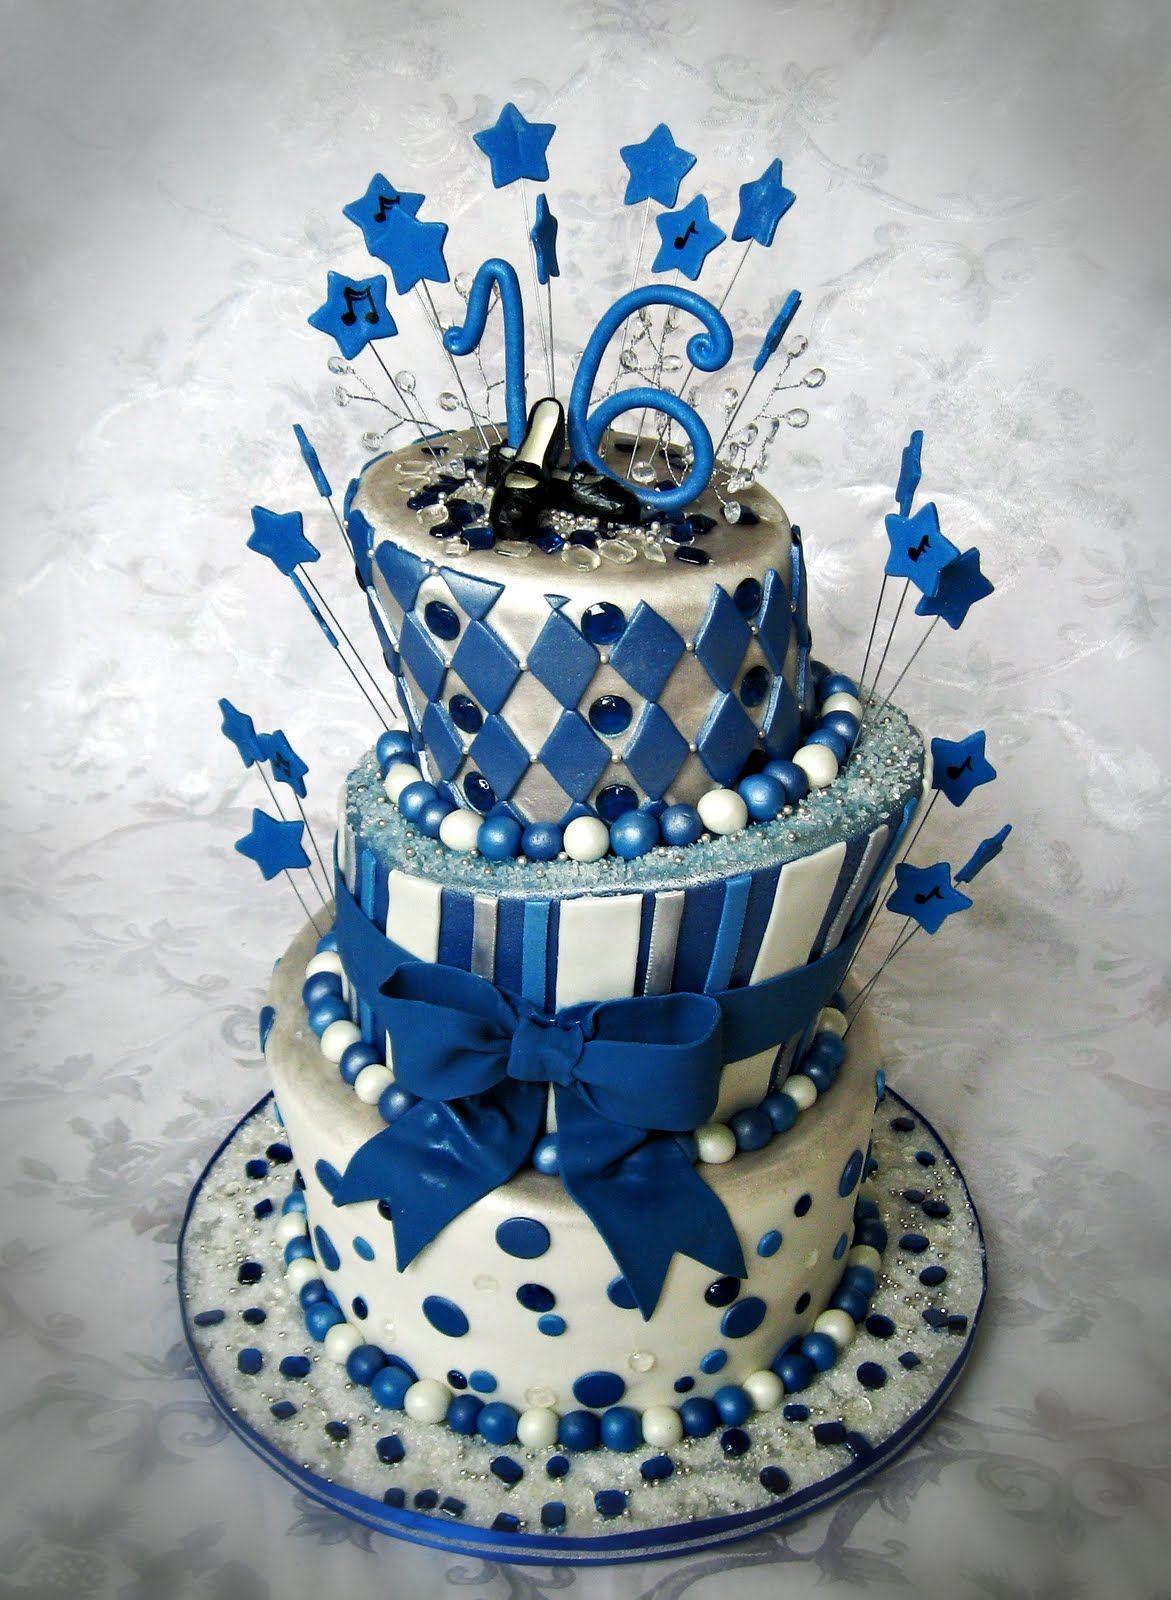 sweet birthday cake designs - Google Search